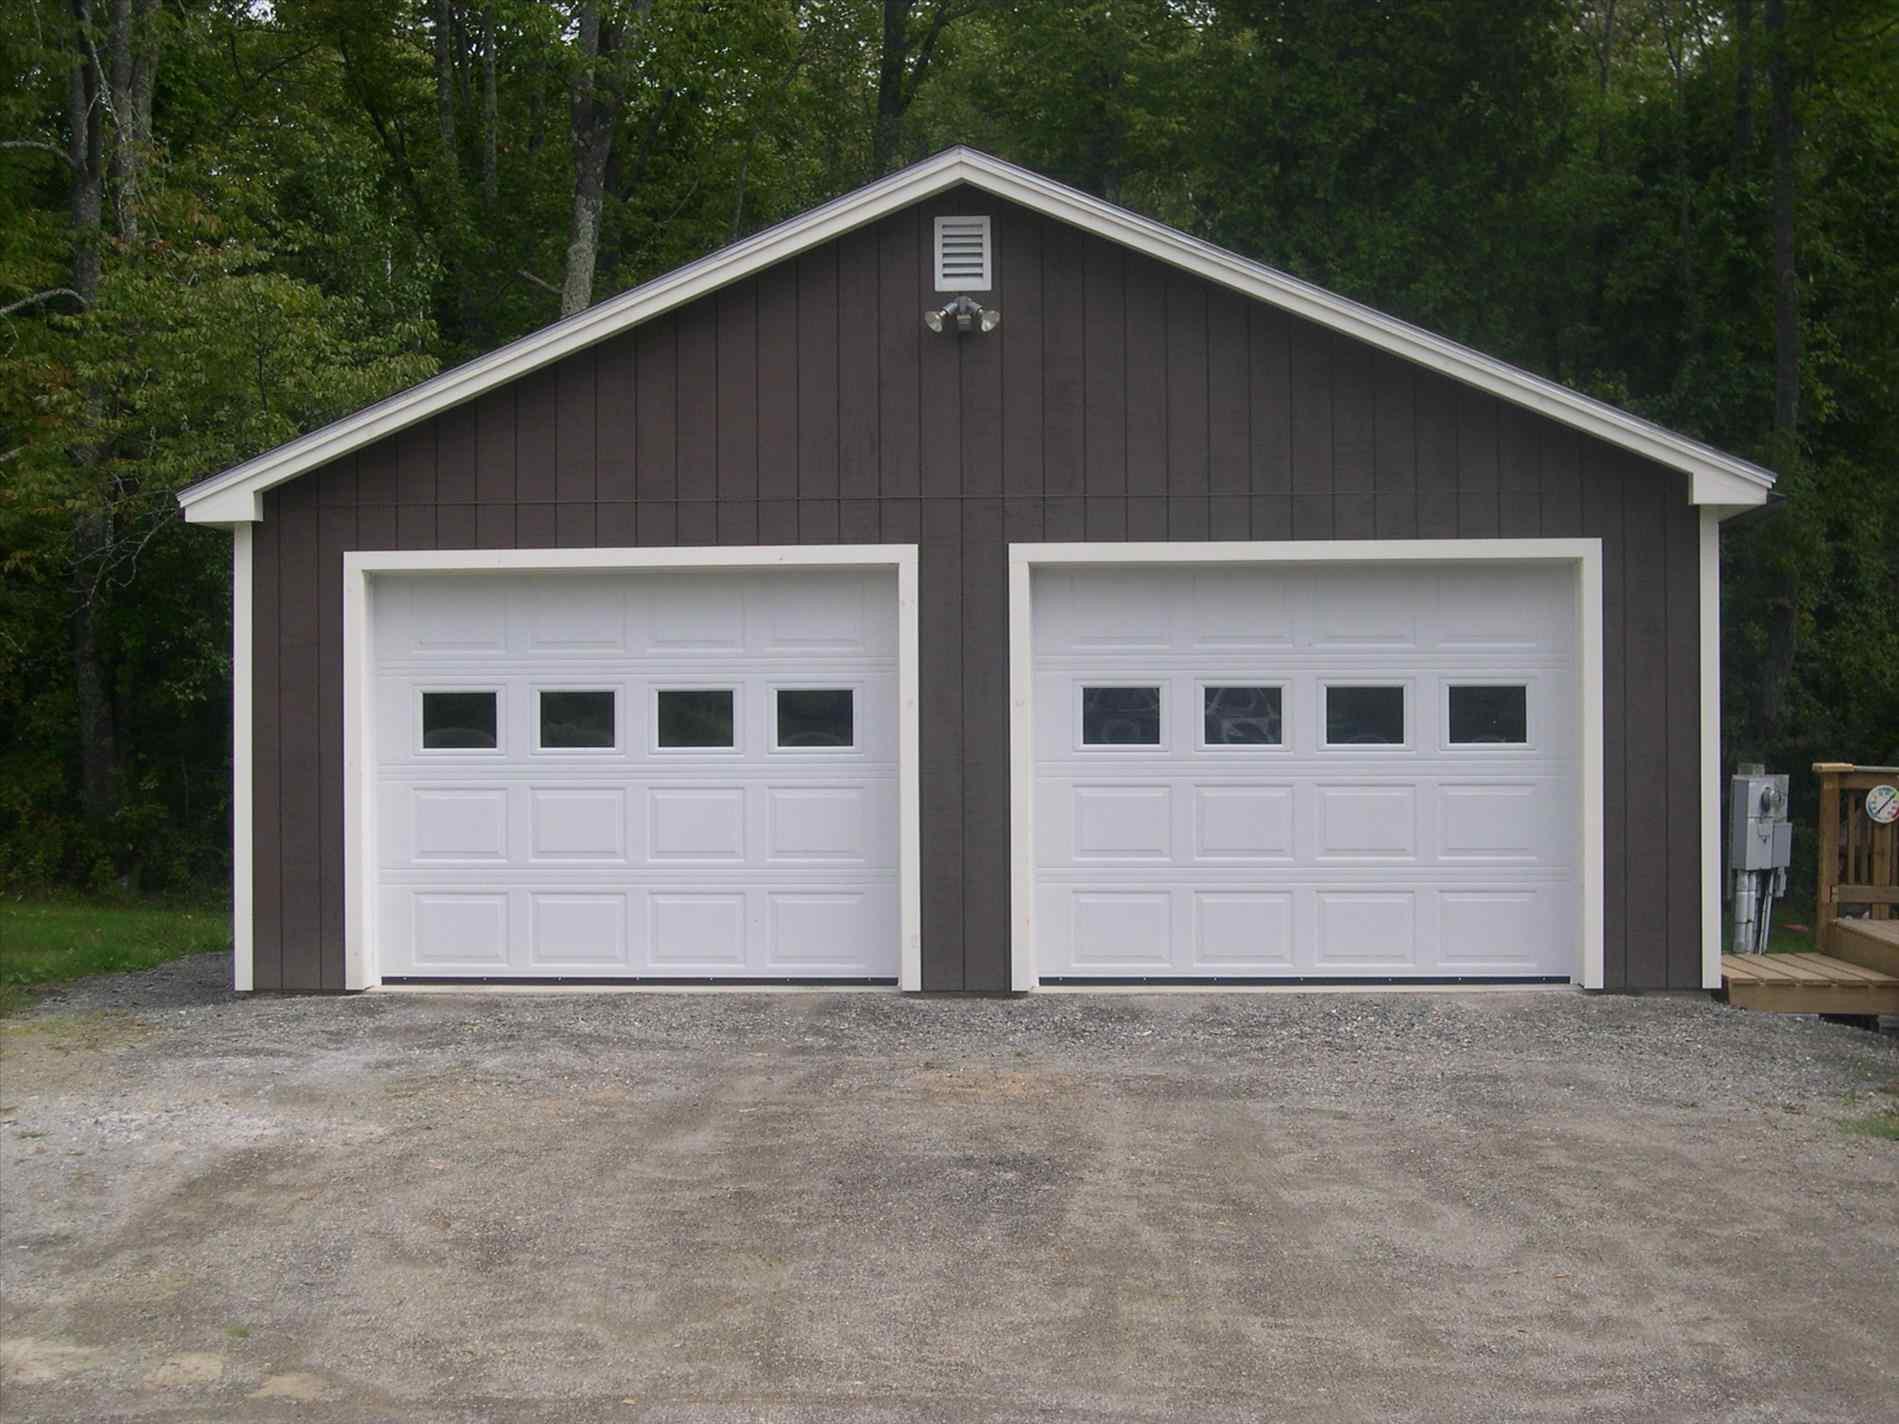 Best ideas about DIY Garage Kit . Save or Pin Garage Building Kits AllstateLogHomes Now.